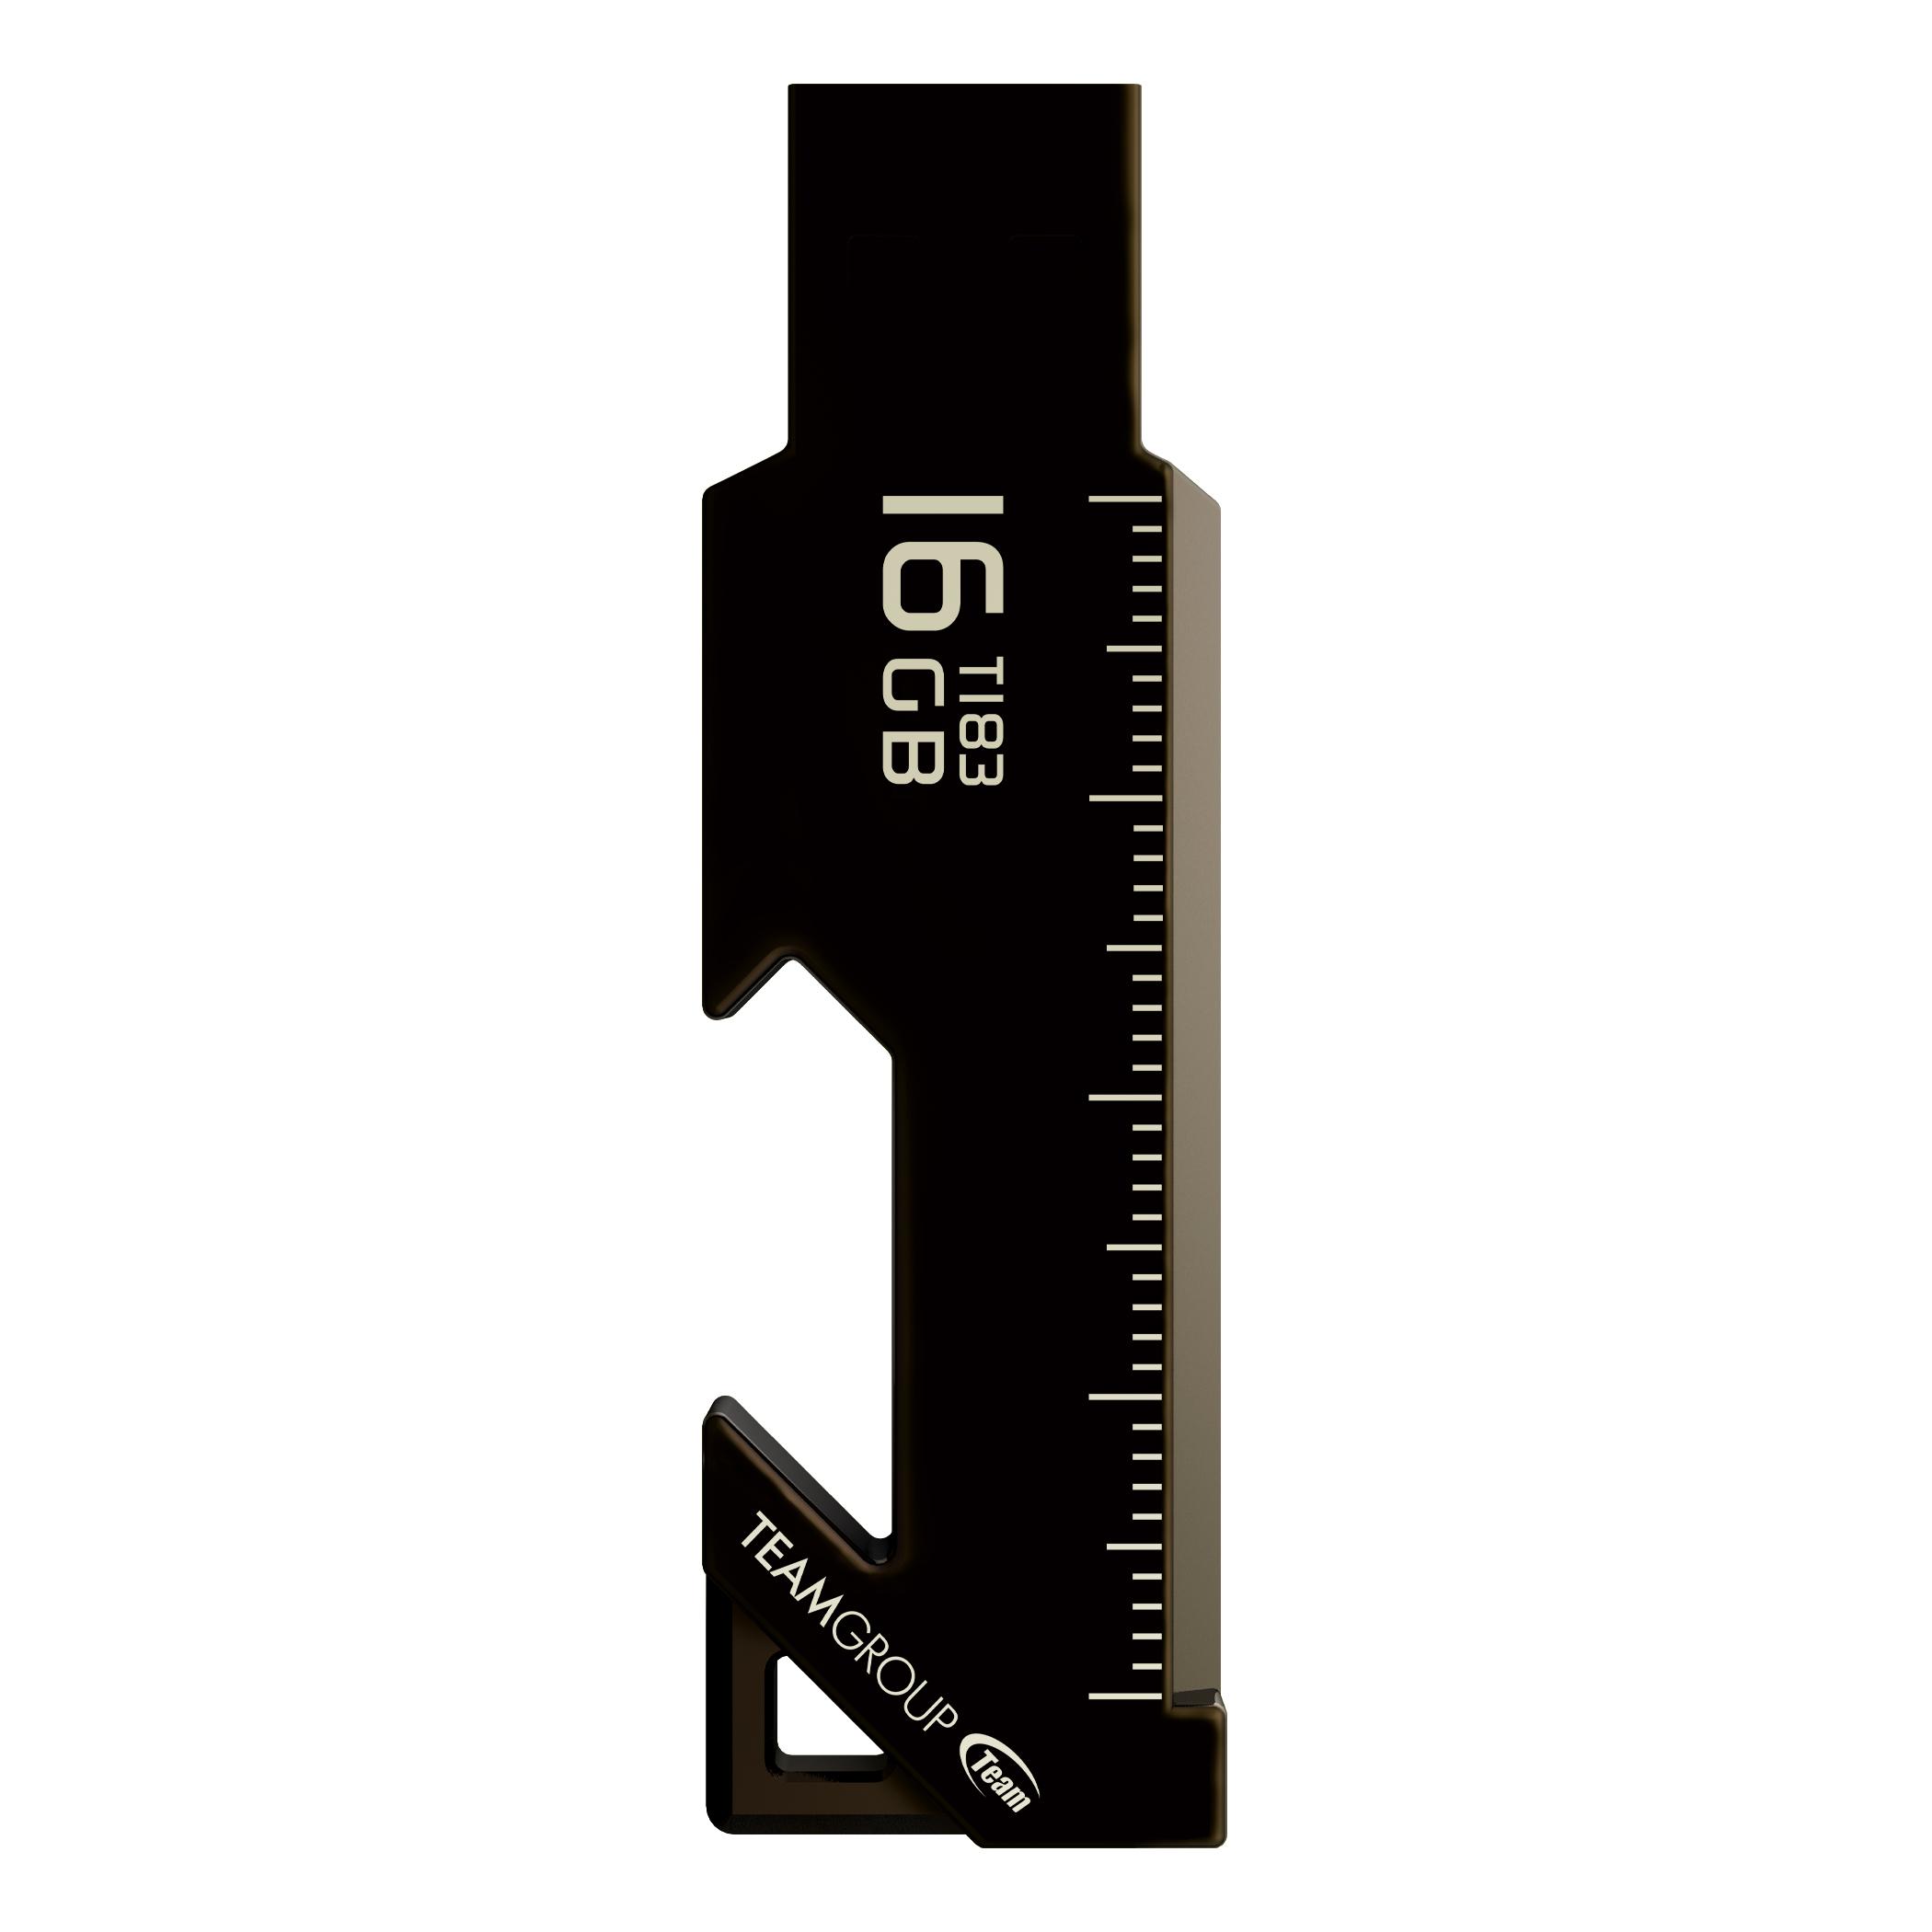 Teamgroup 16GB T183 USB 3.1 spominski ključek